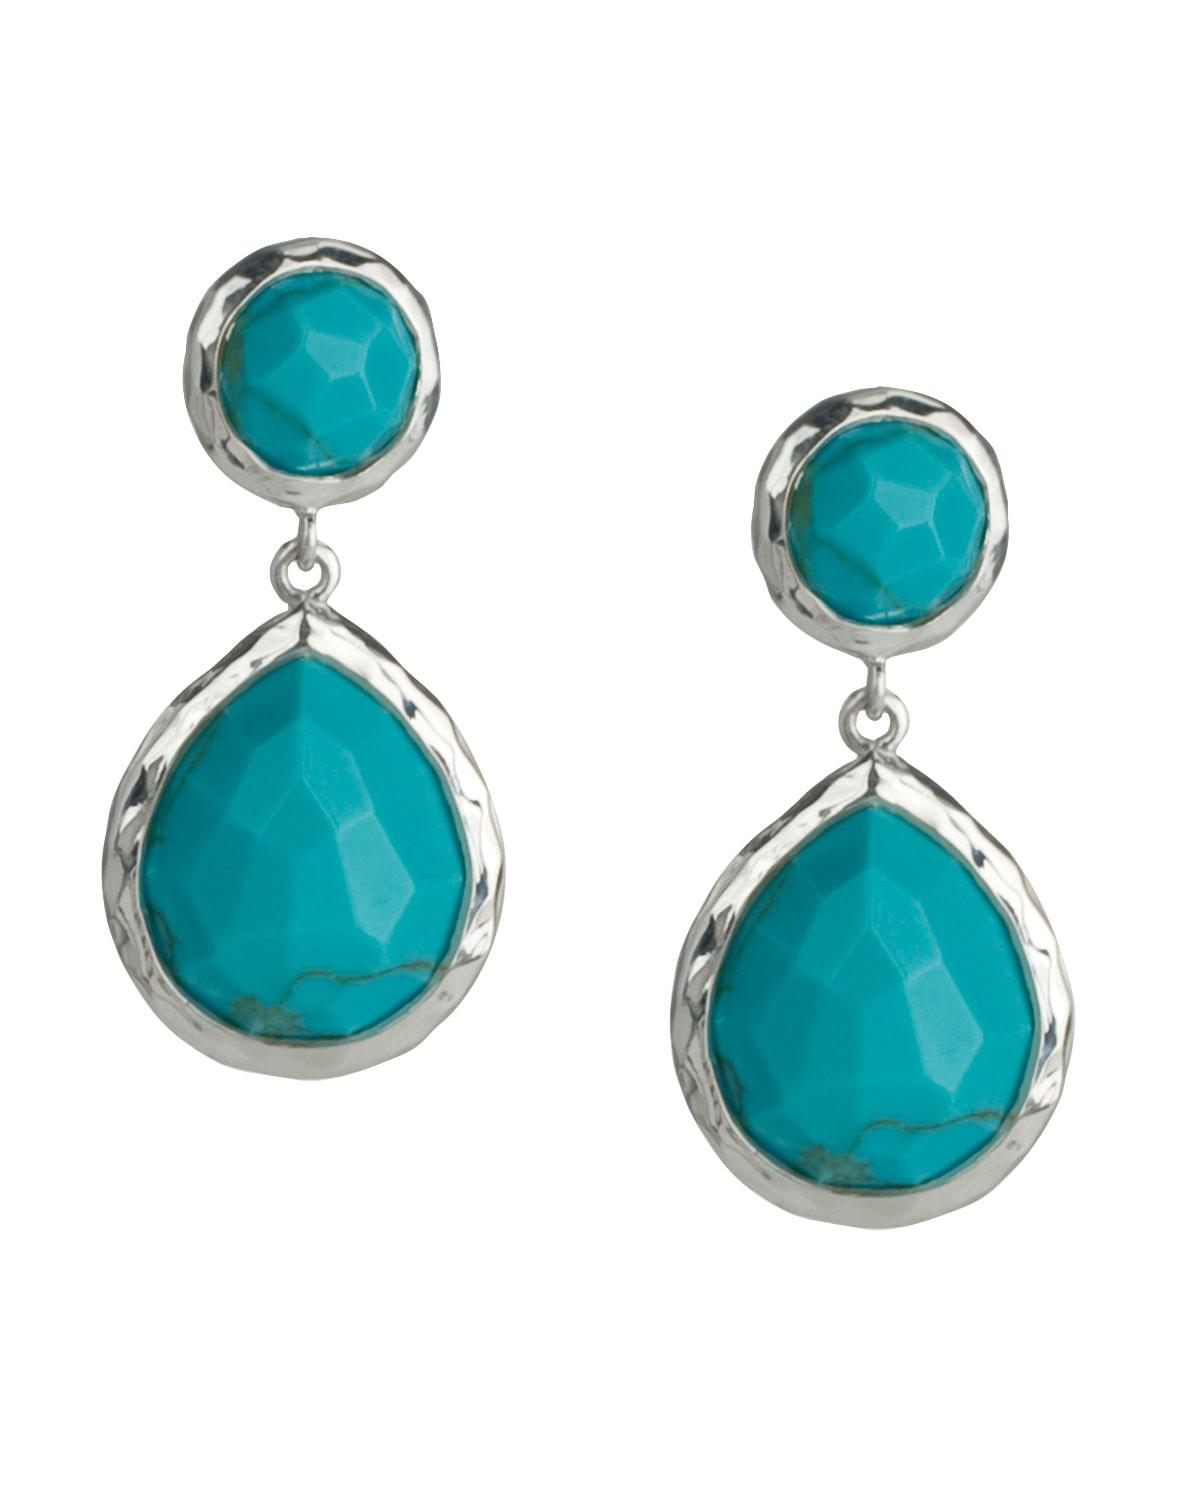 925 Rock Candy Snowman Earrings In Turquoise